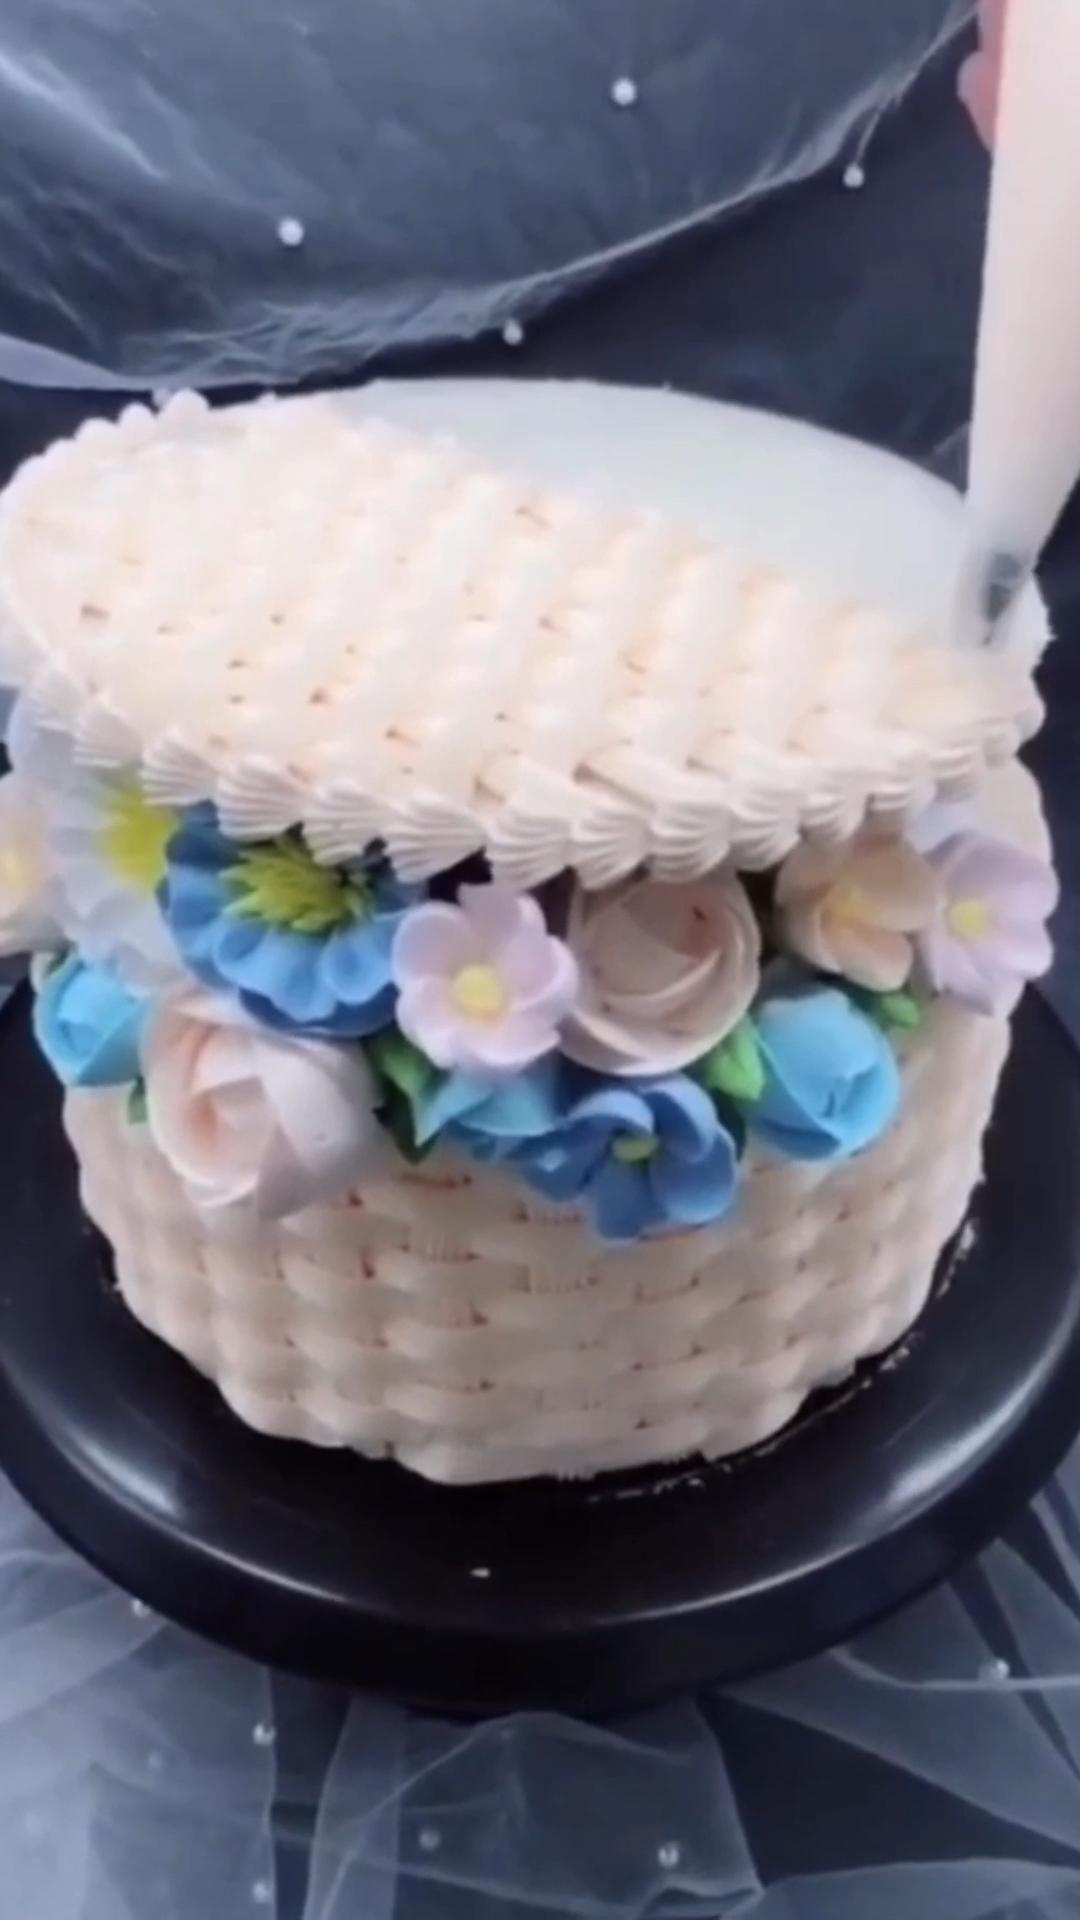 Beautiful cake deo